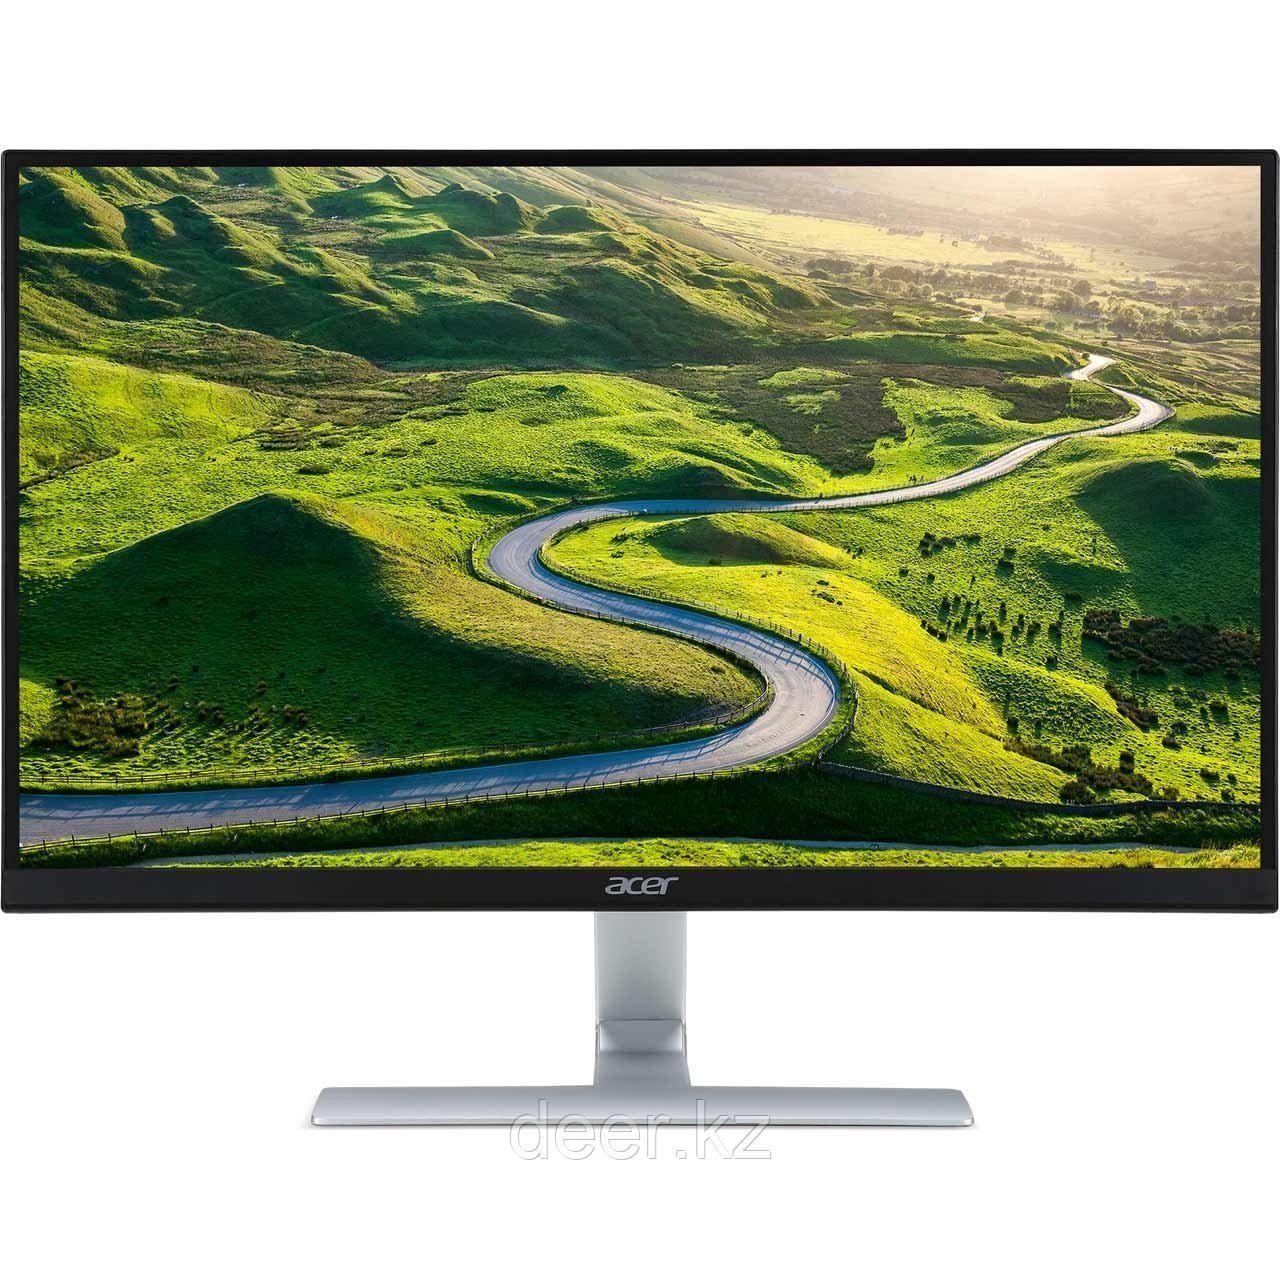 Монитор Acer/RT270bmid /27 '' IPS /1920x1080 UM.HR0EE.002